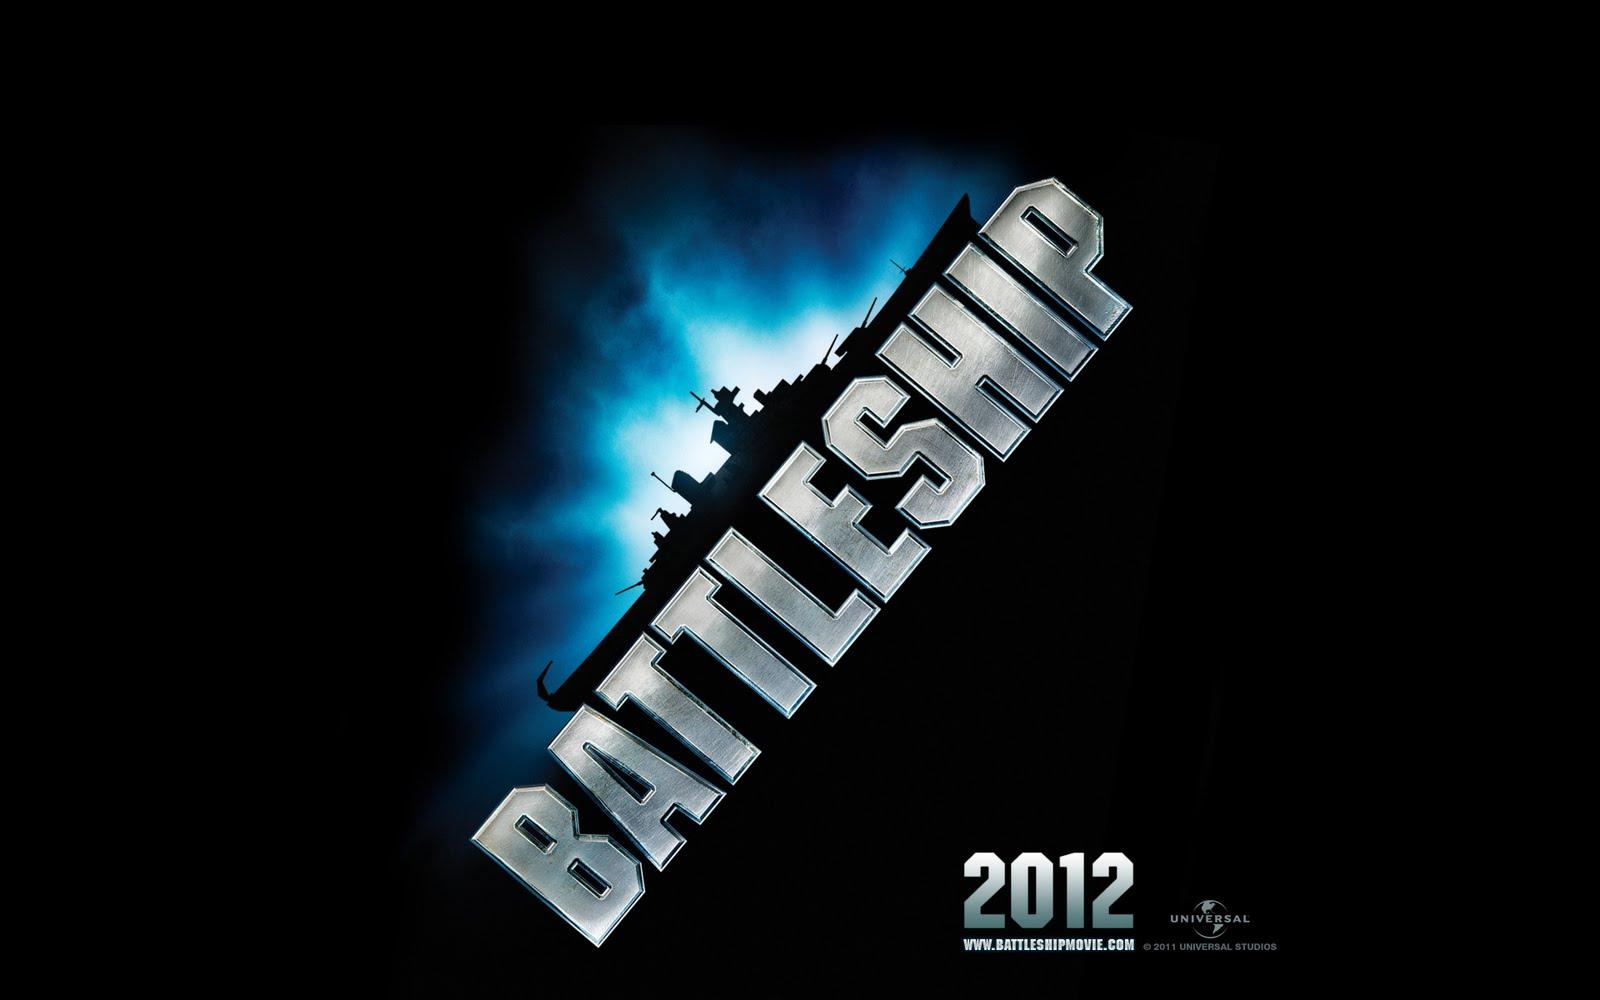 http://3.bp.blogspot.com/-U8KXUHoSrCc/TuTsr371ycI/AAAAAAAAAco/LiPkgOr5e_8/s1600/Battleship+Poster.+TM%2526Copyright+2011.+Universal+Pictures%252C+Battleship+Delta+Productions%252C+Film+44%252C+Hasbro%252C+Stuber+Productions..jpg